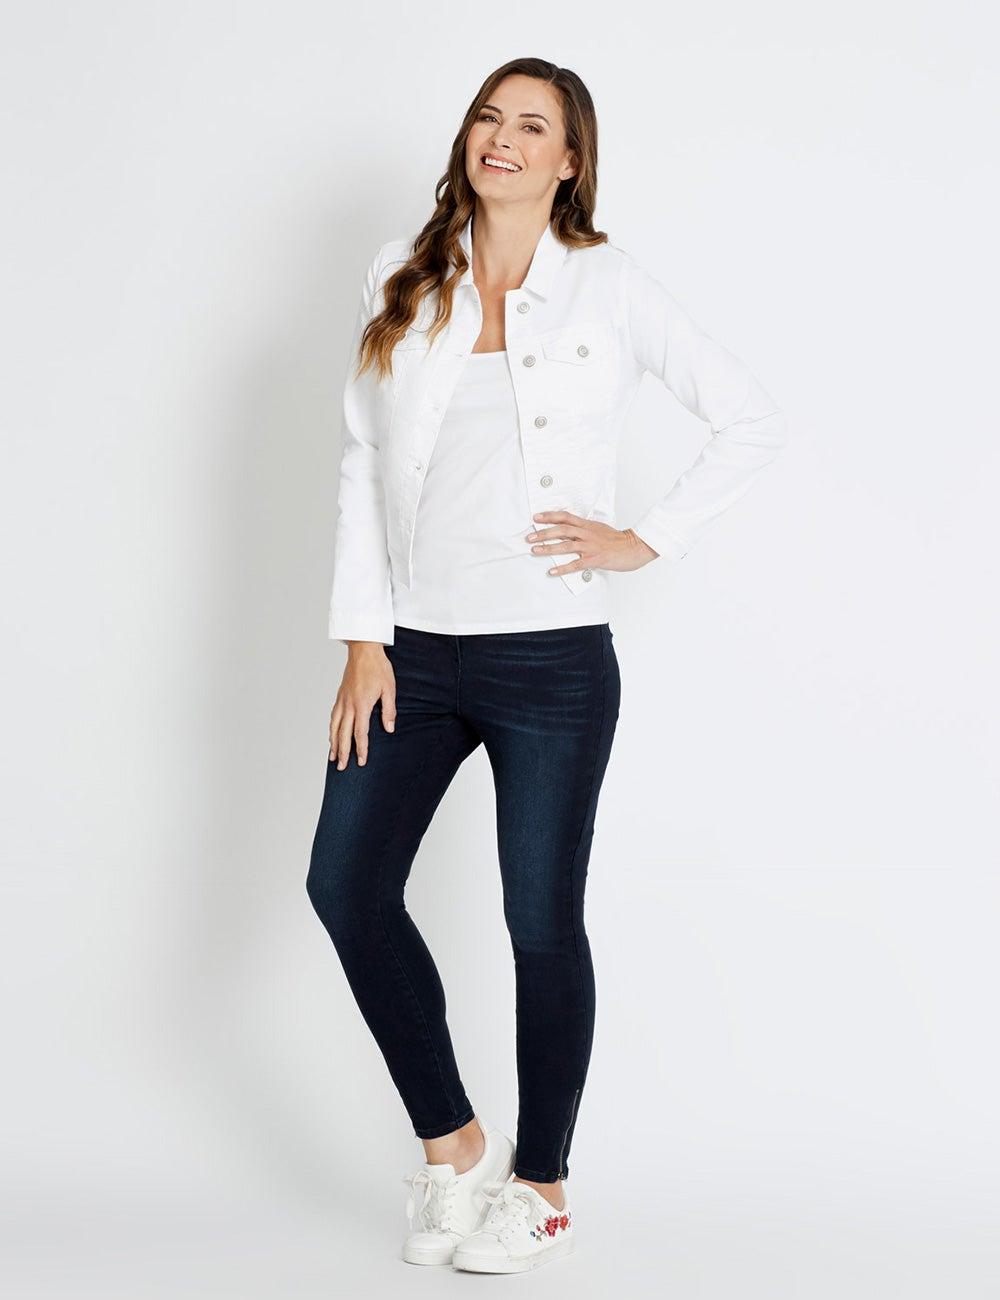 pants, shirt, denim jacket, adidas Wheretoget